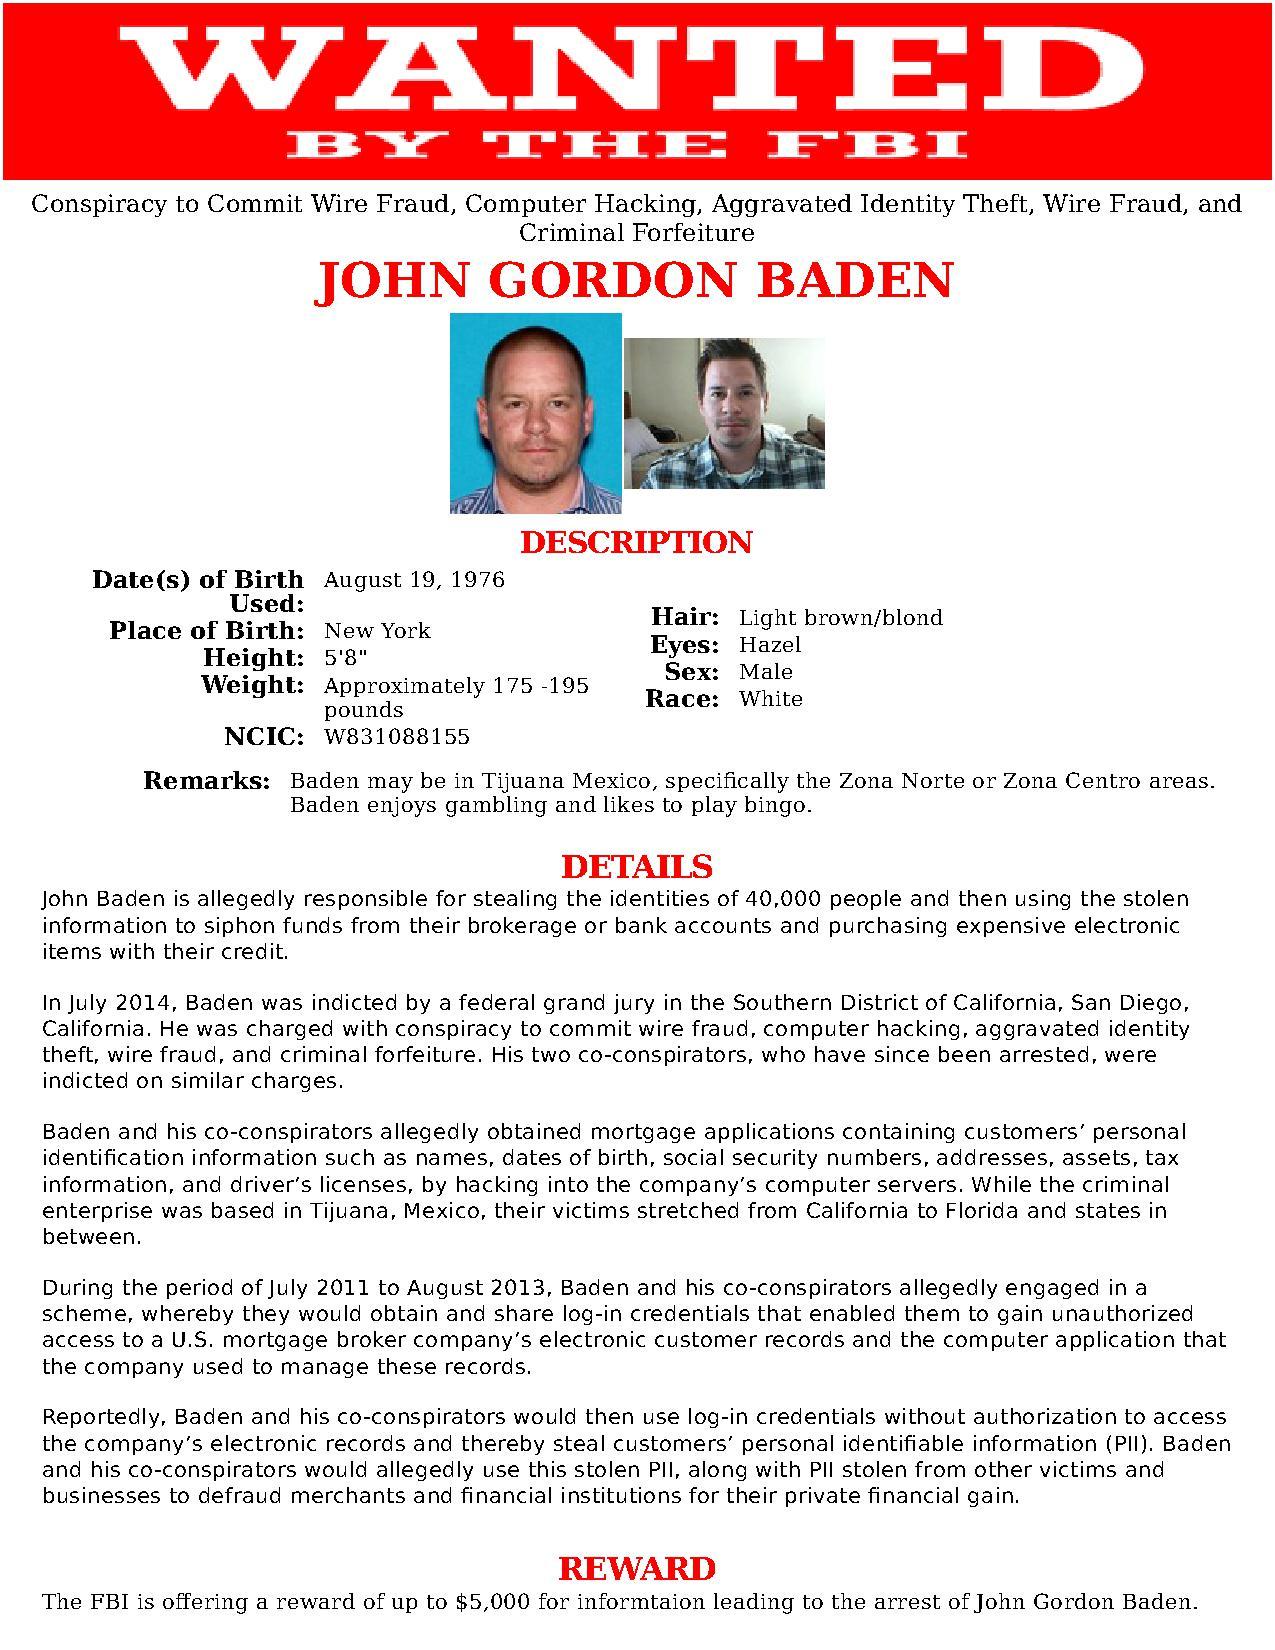 john-gordon-baden (1)_1